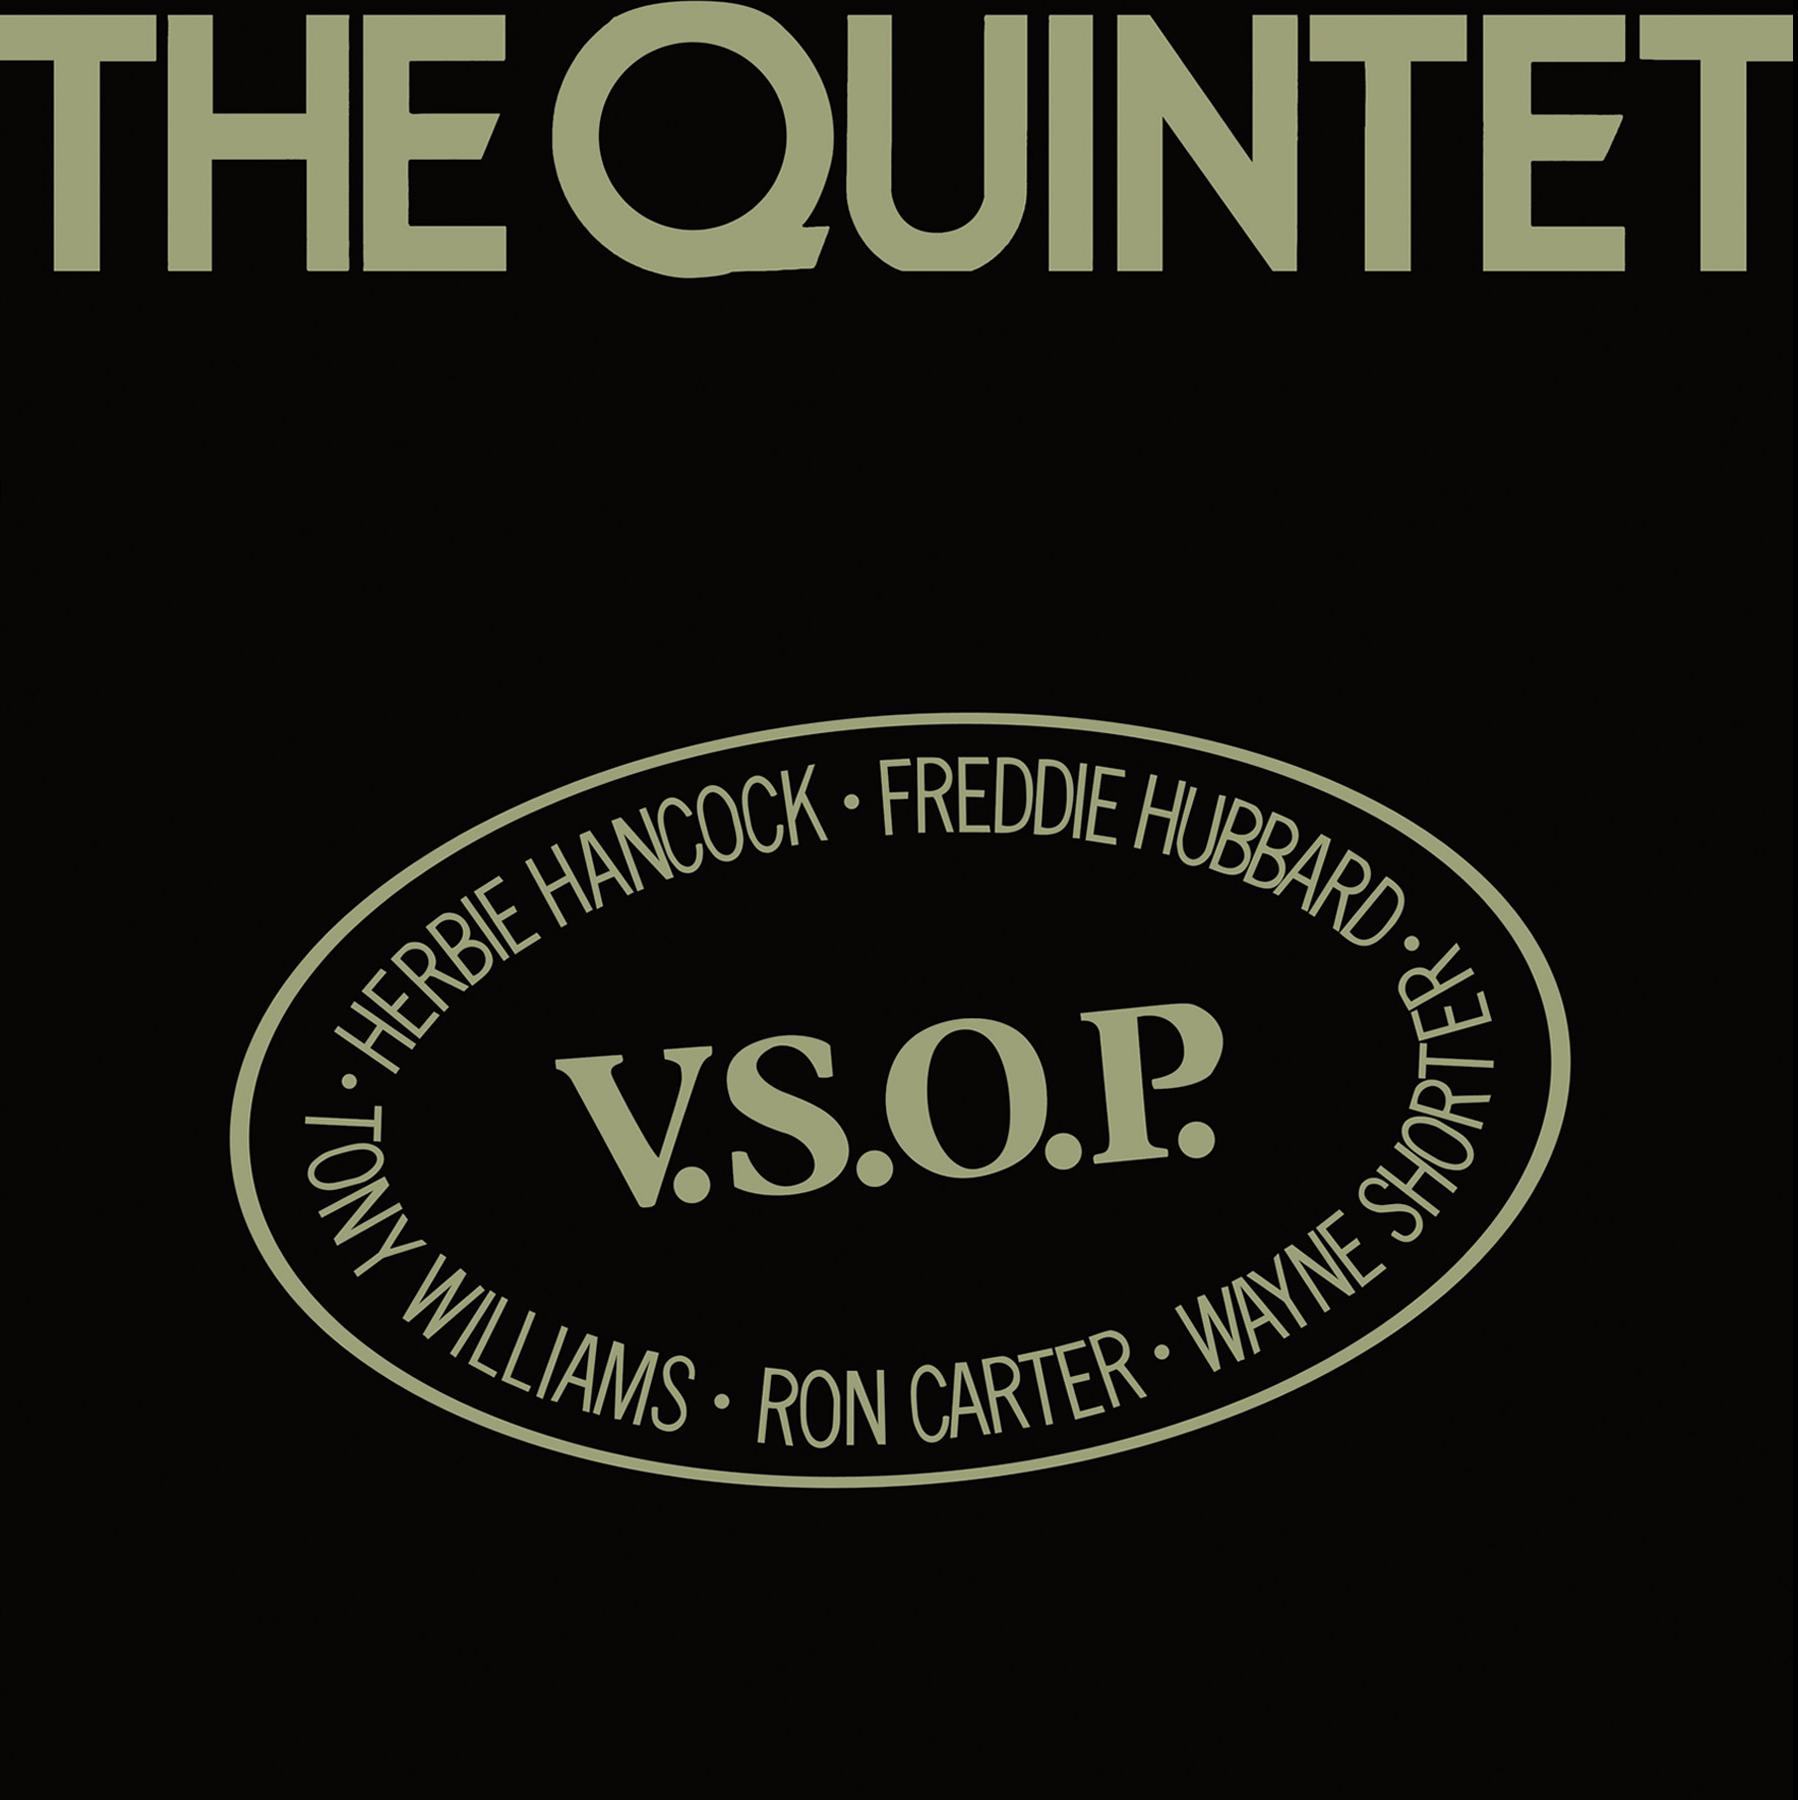 V.S.O.P. The Quintet